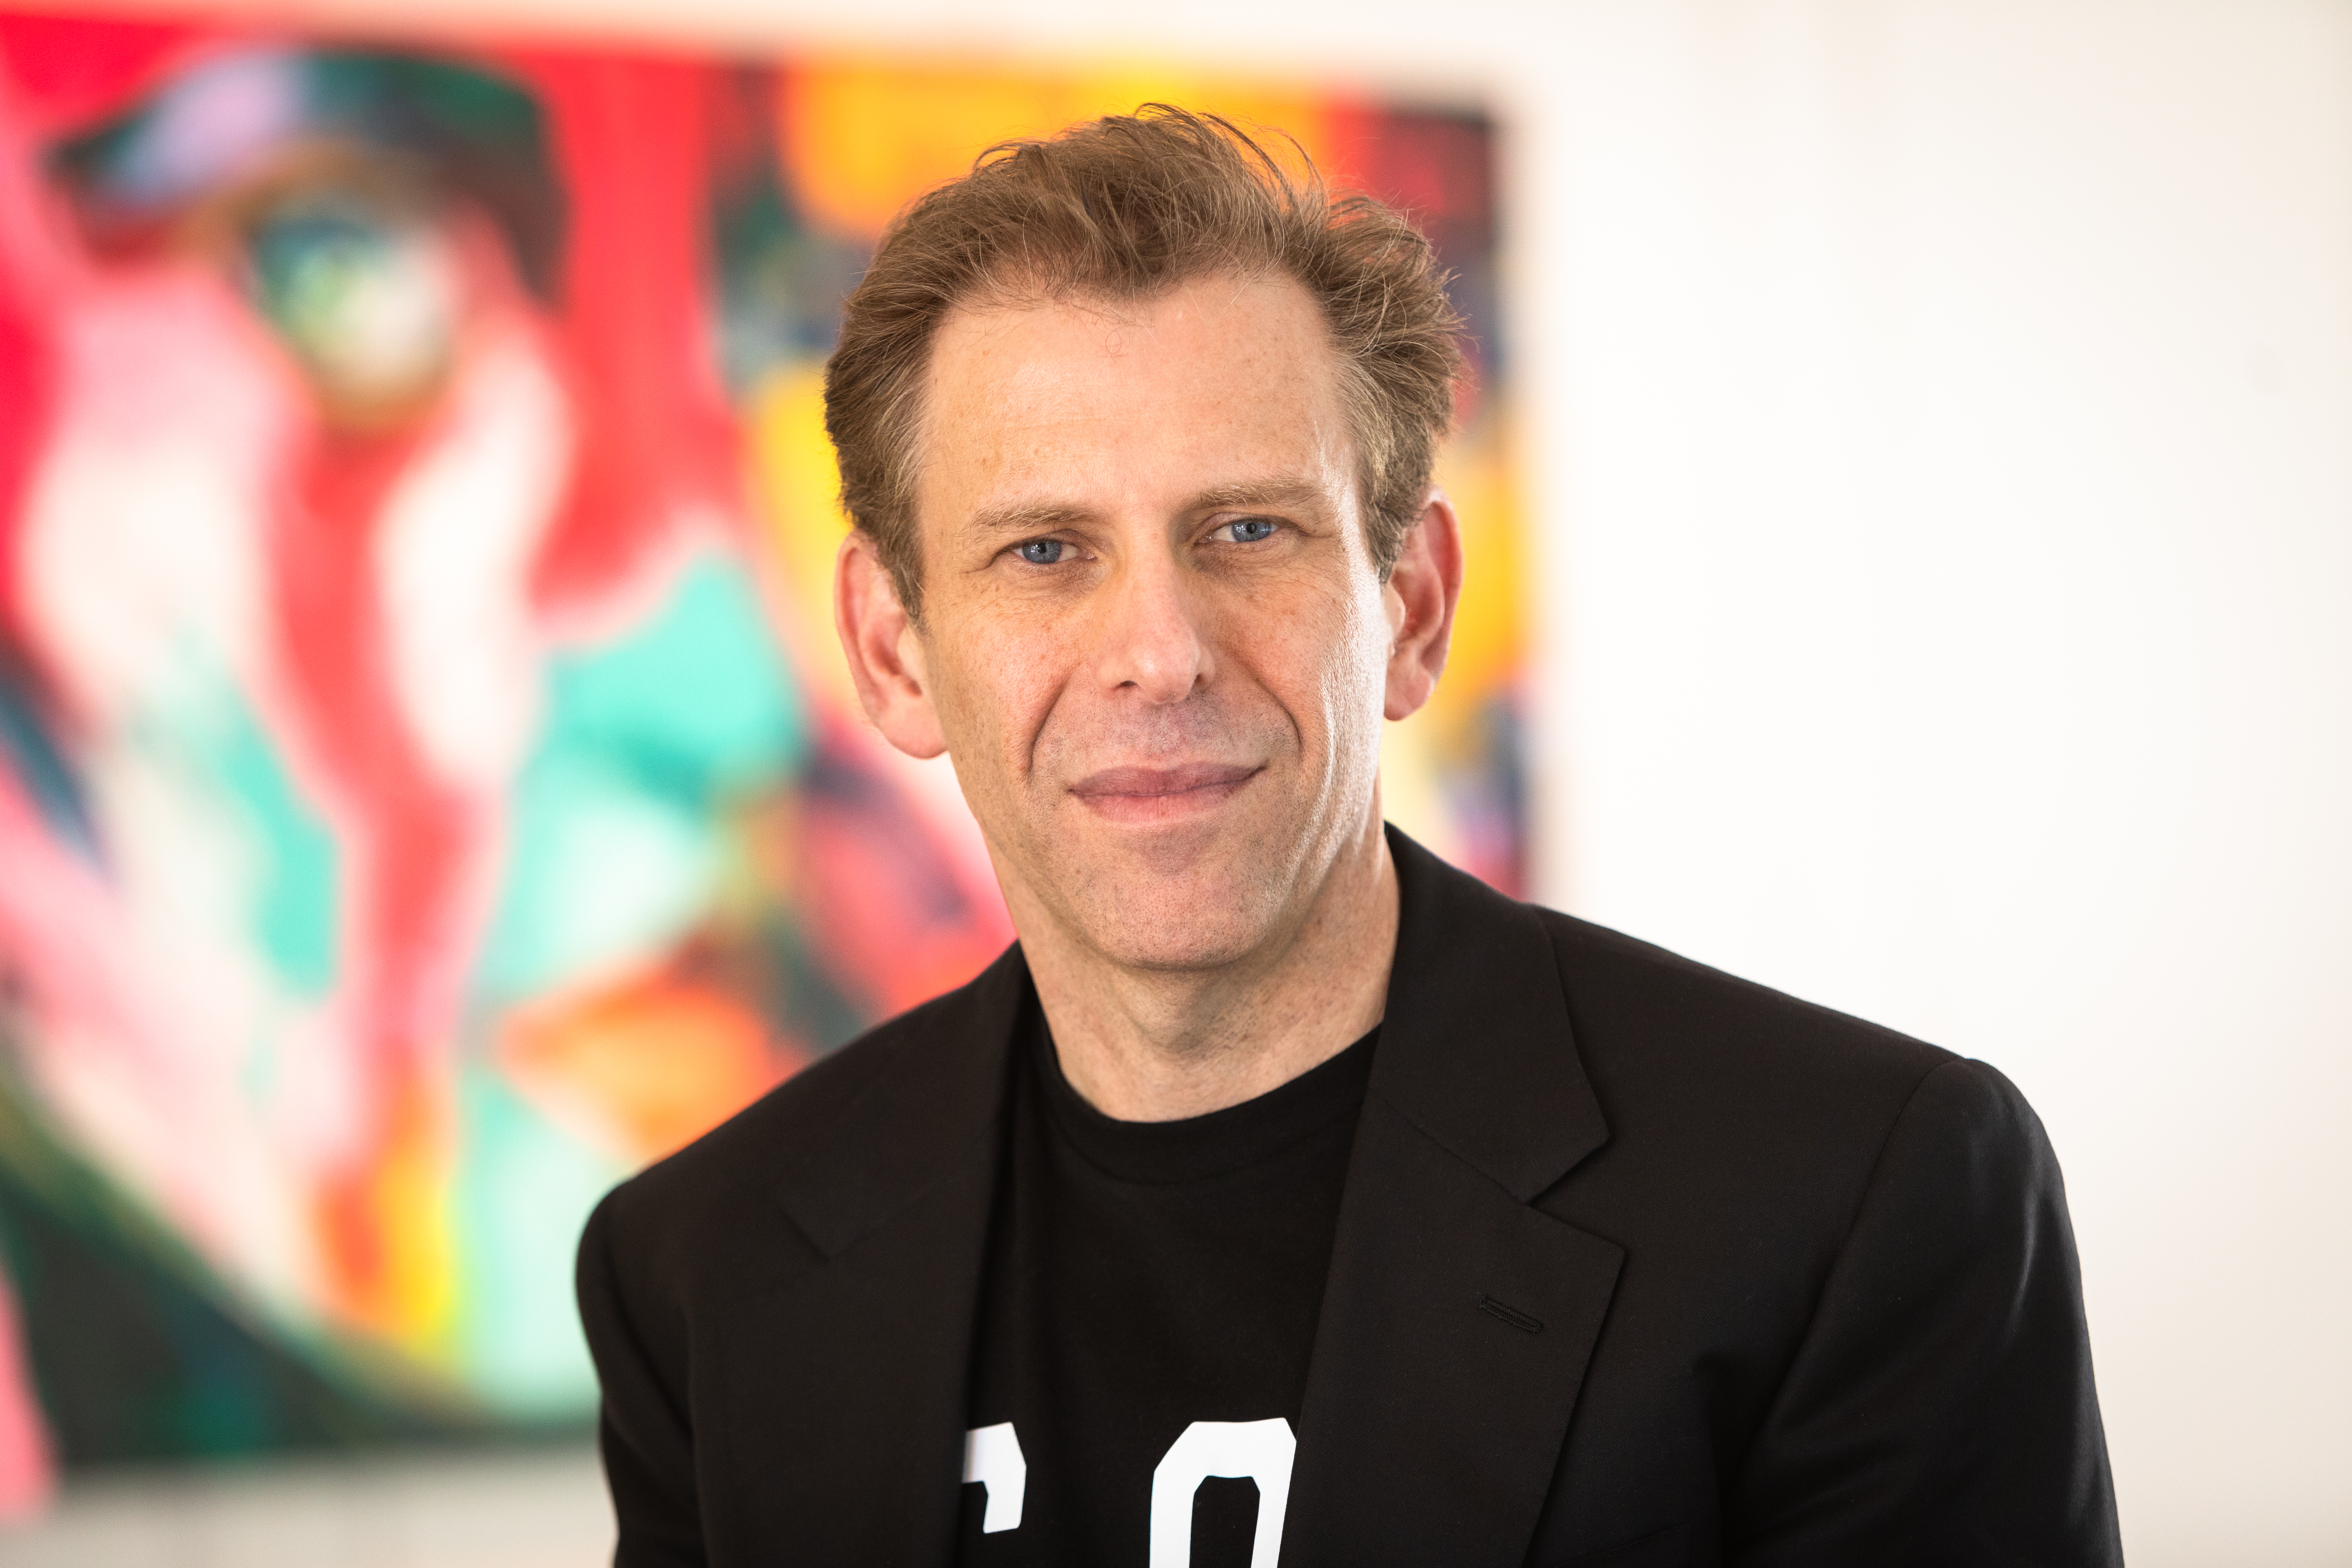 Of Mondrian South Beach To Investor